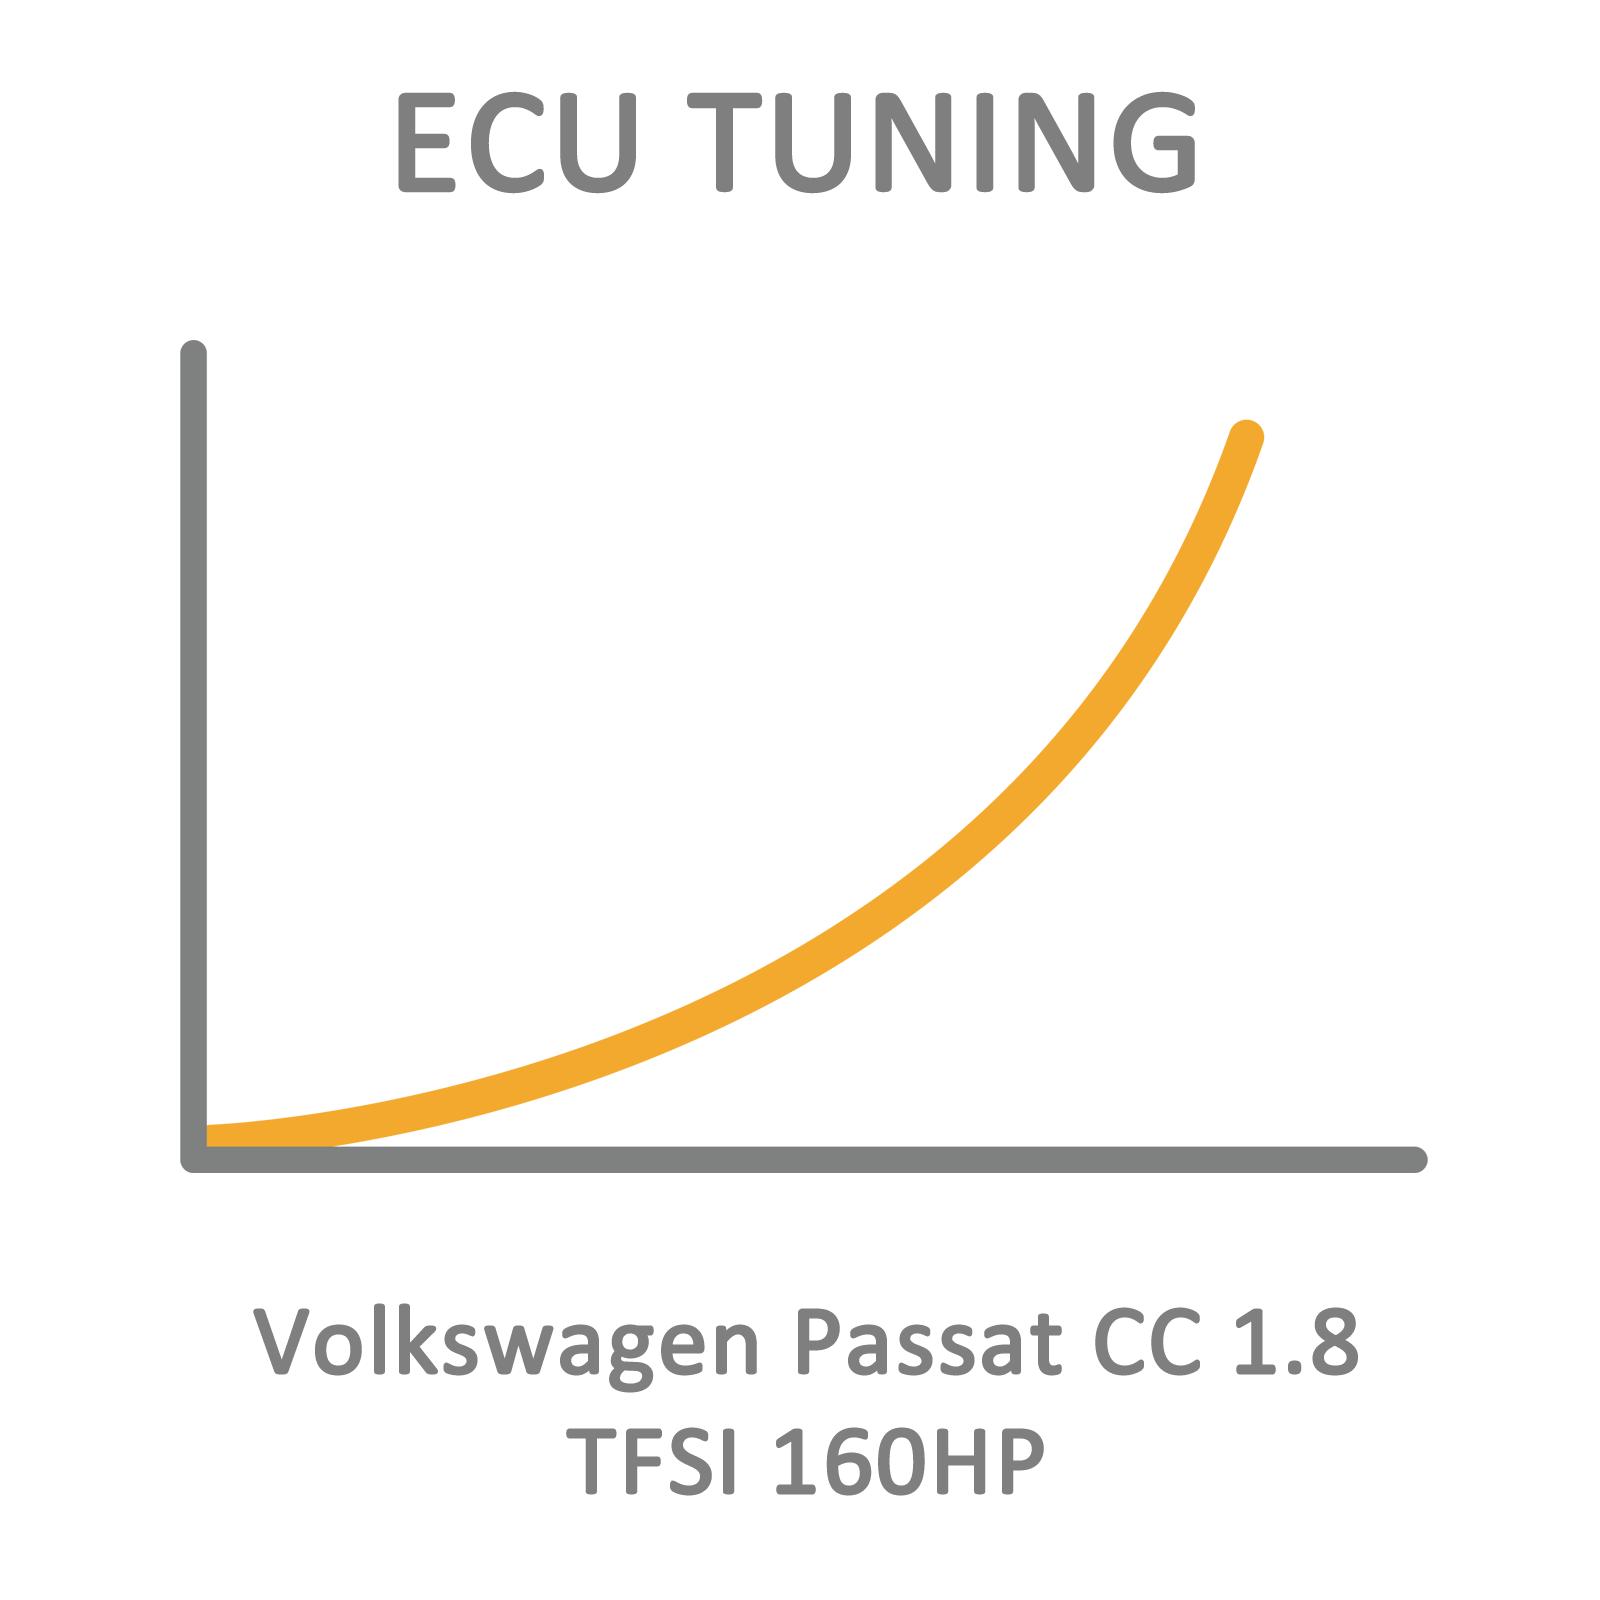 Volkswagen Passat CC 1.8 TFSI 160HP ECU Tuning Remapping